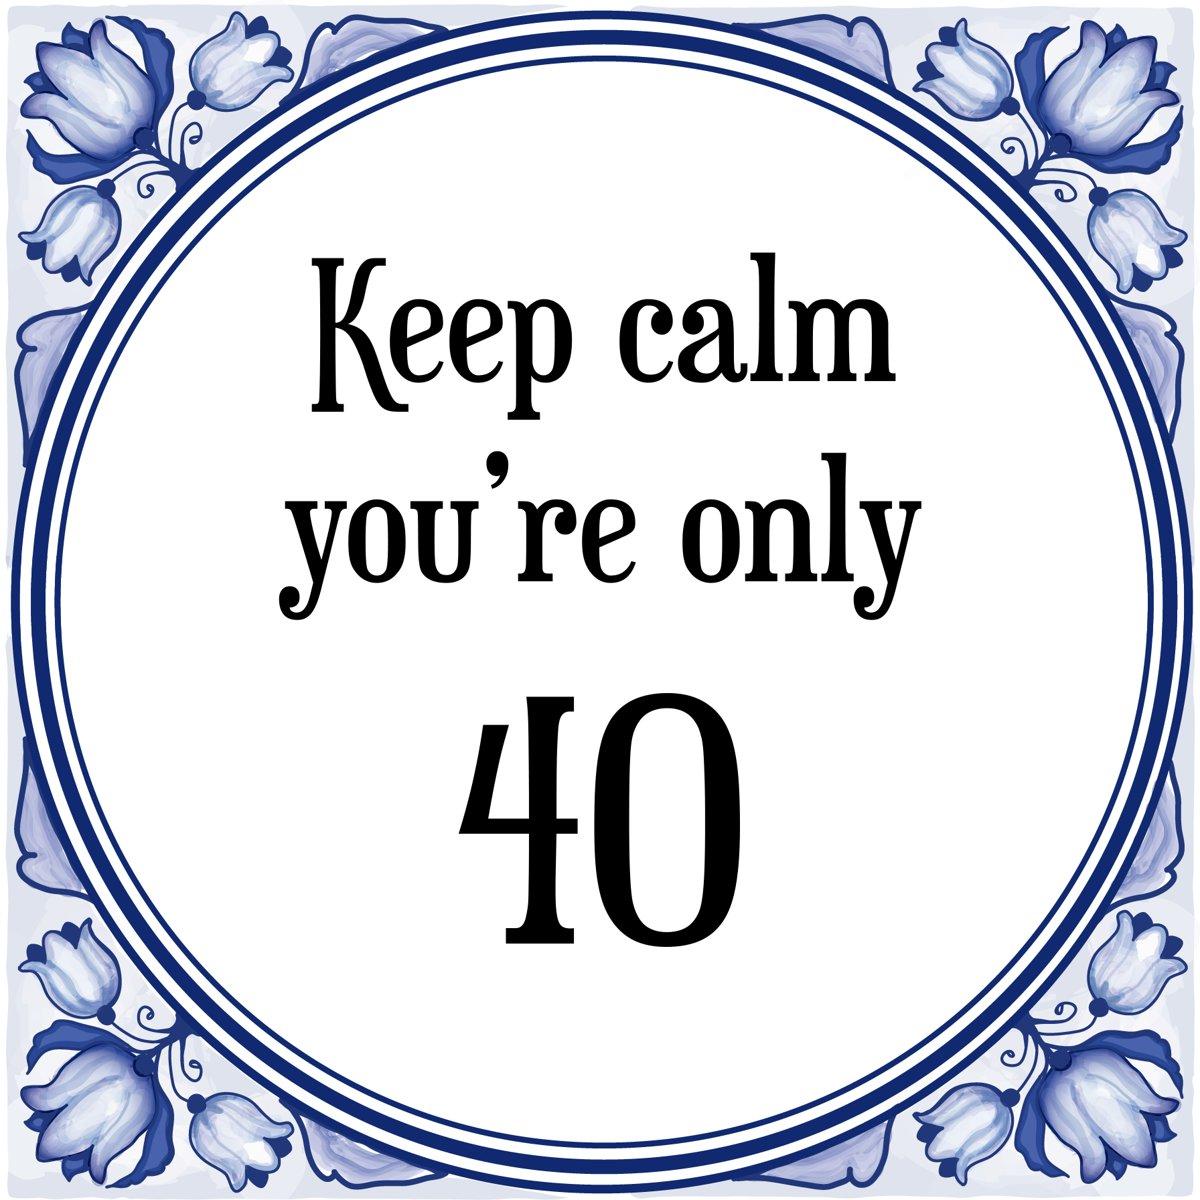 Bol Com Verjaardag Tegeltje Met Spreuk 40 Jaar Keep Calm You Re